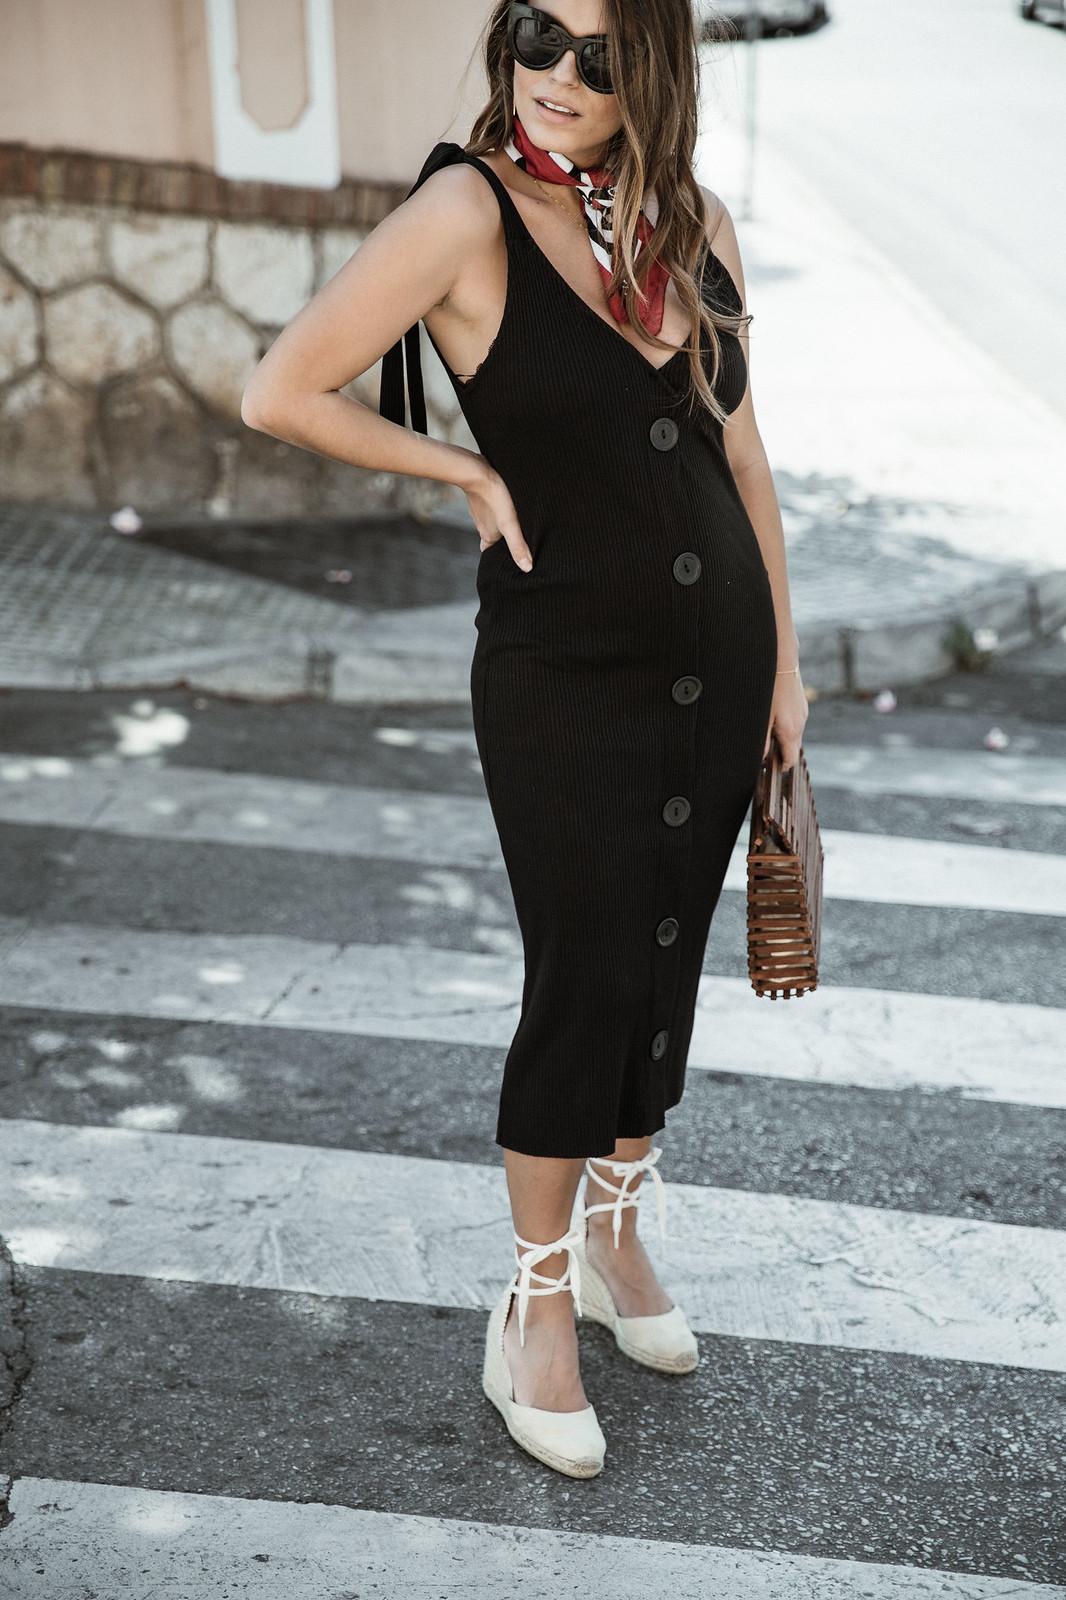 seams for a desire - jessie chanes - black tight dress - zara-12